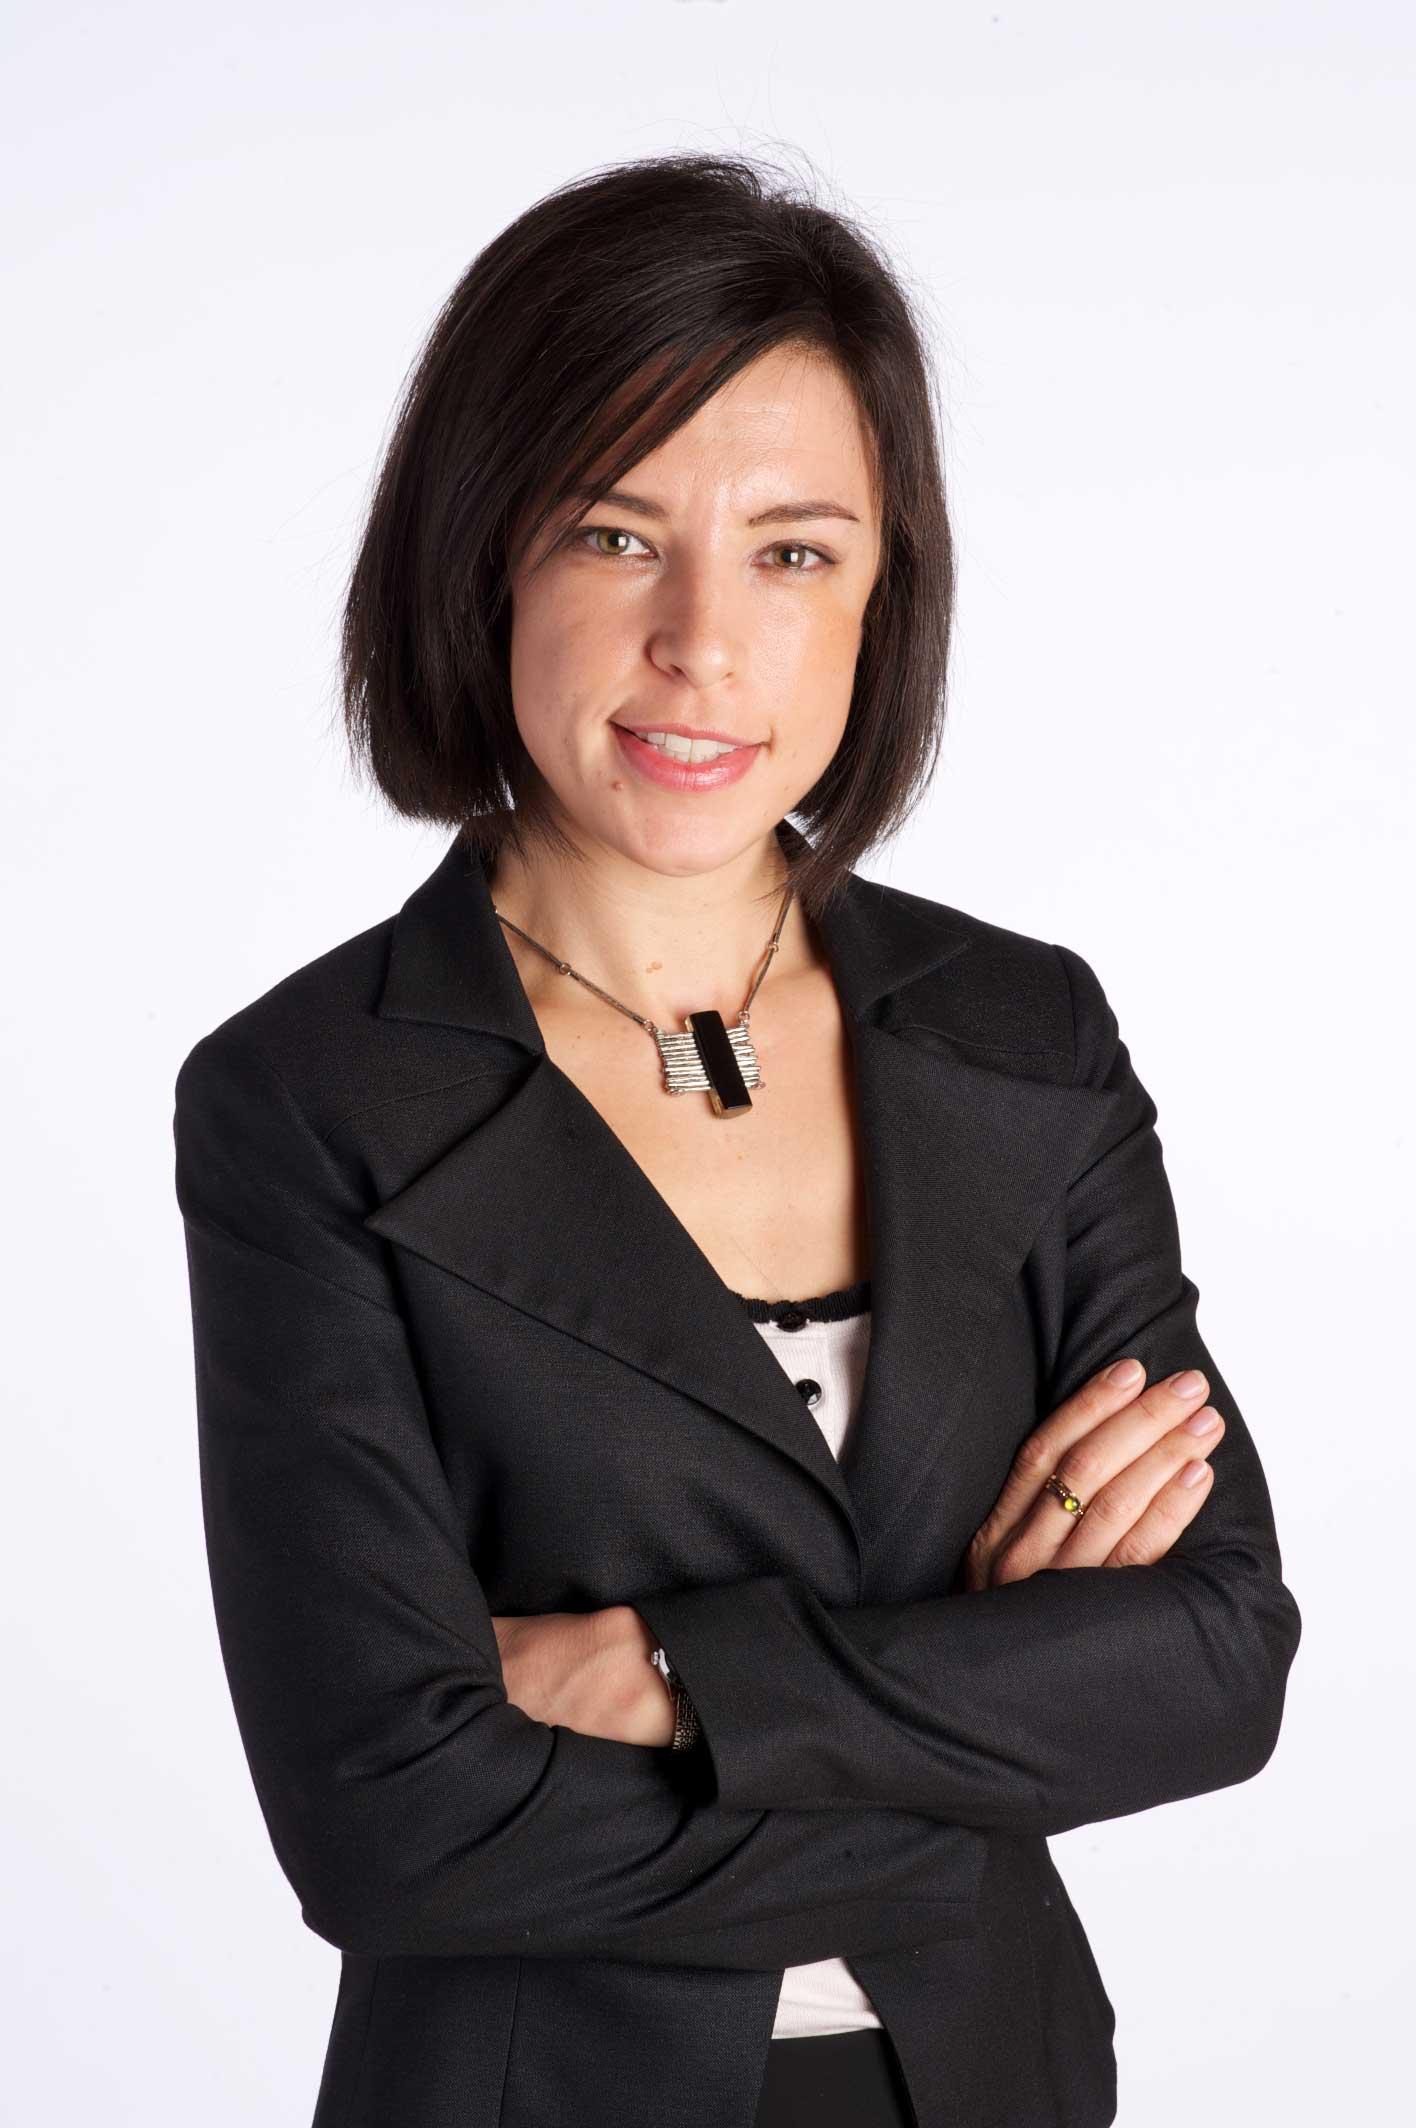 Natalie Hand, Partner at Meridia Recruitment Solutions